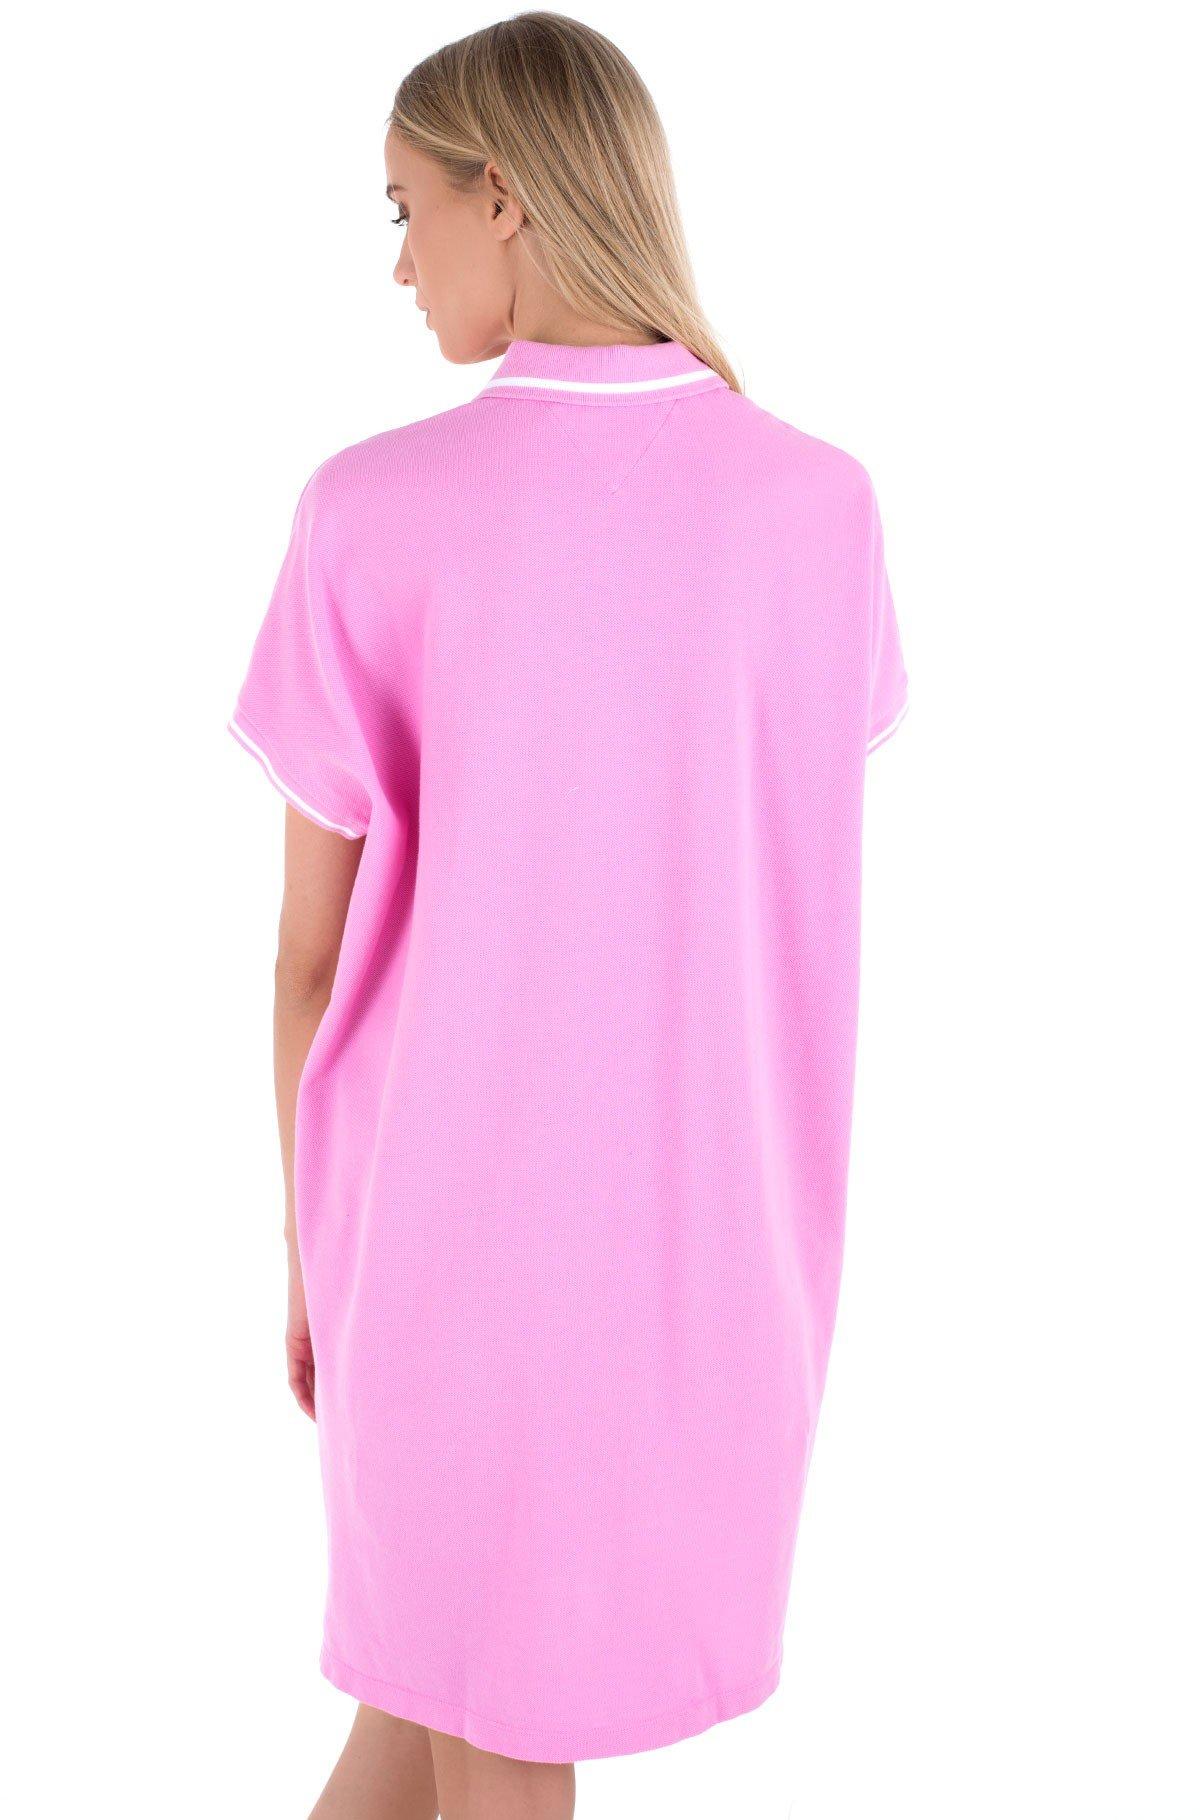 Polo suknelė TJW MODERN LOGO POLO DRESS-full-2